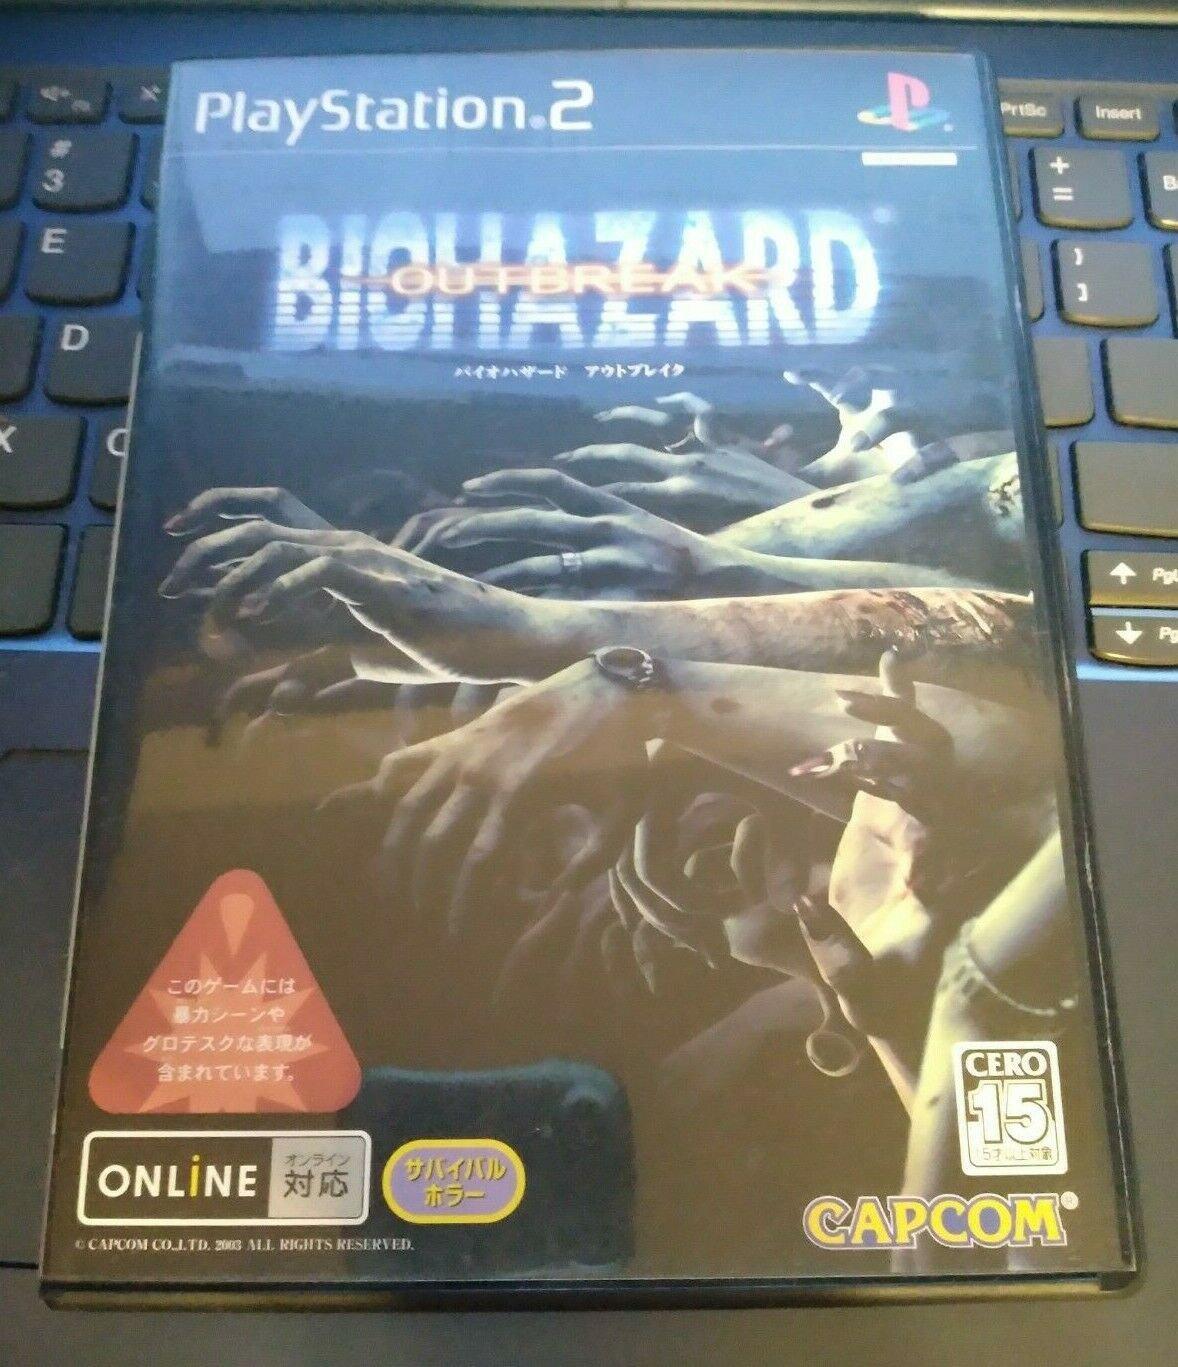 Biohazard Outbreak (Sony PlayStation 2 2003) JAPAN IMPORT READ PS2 Resident Evil